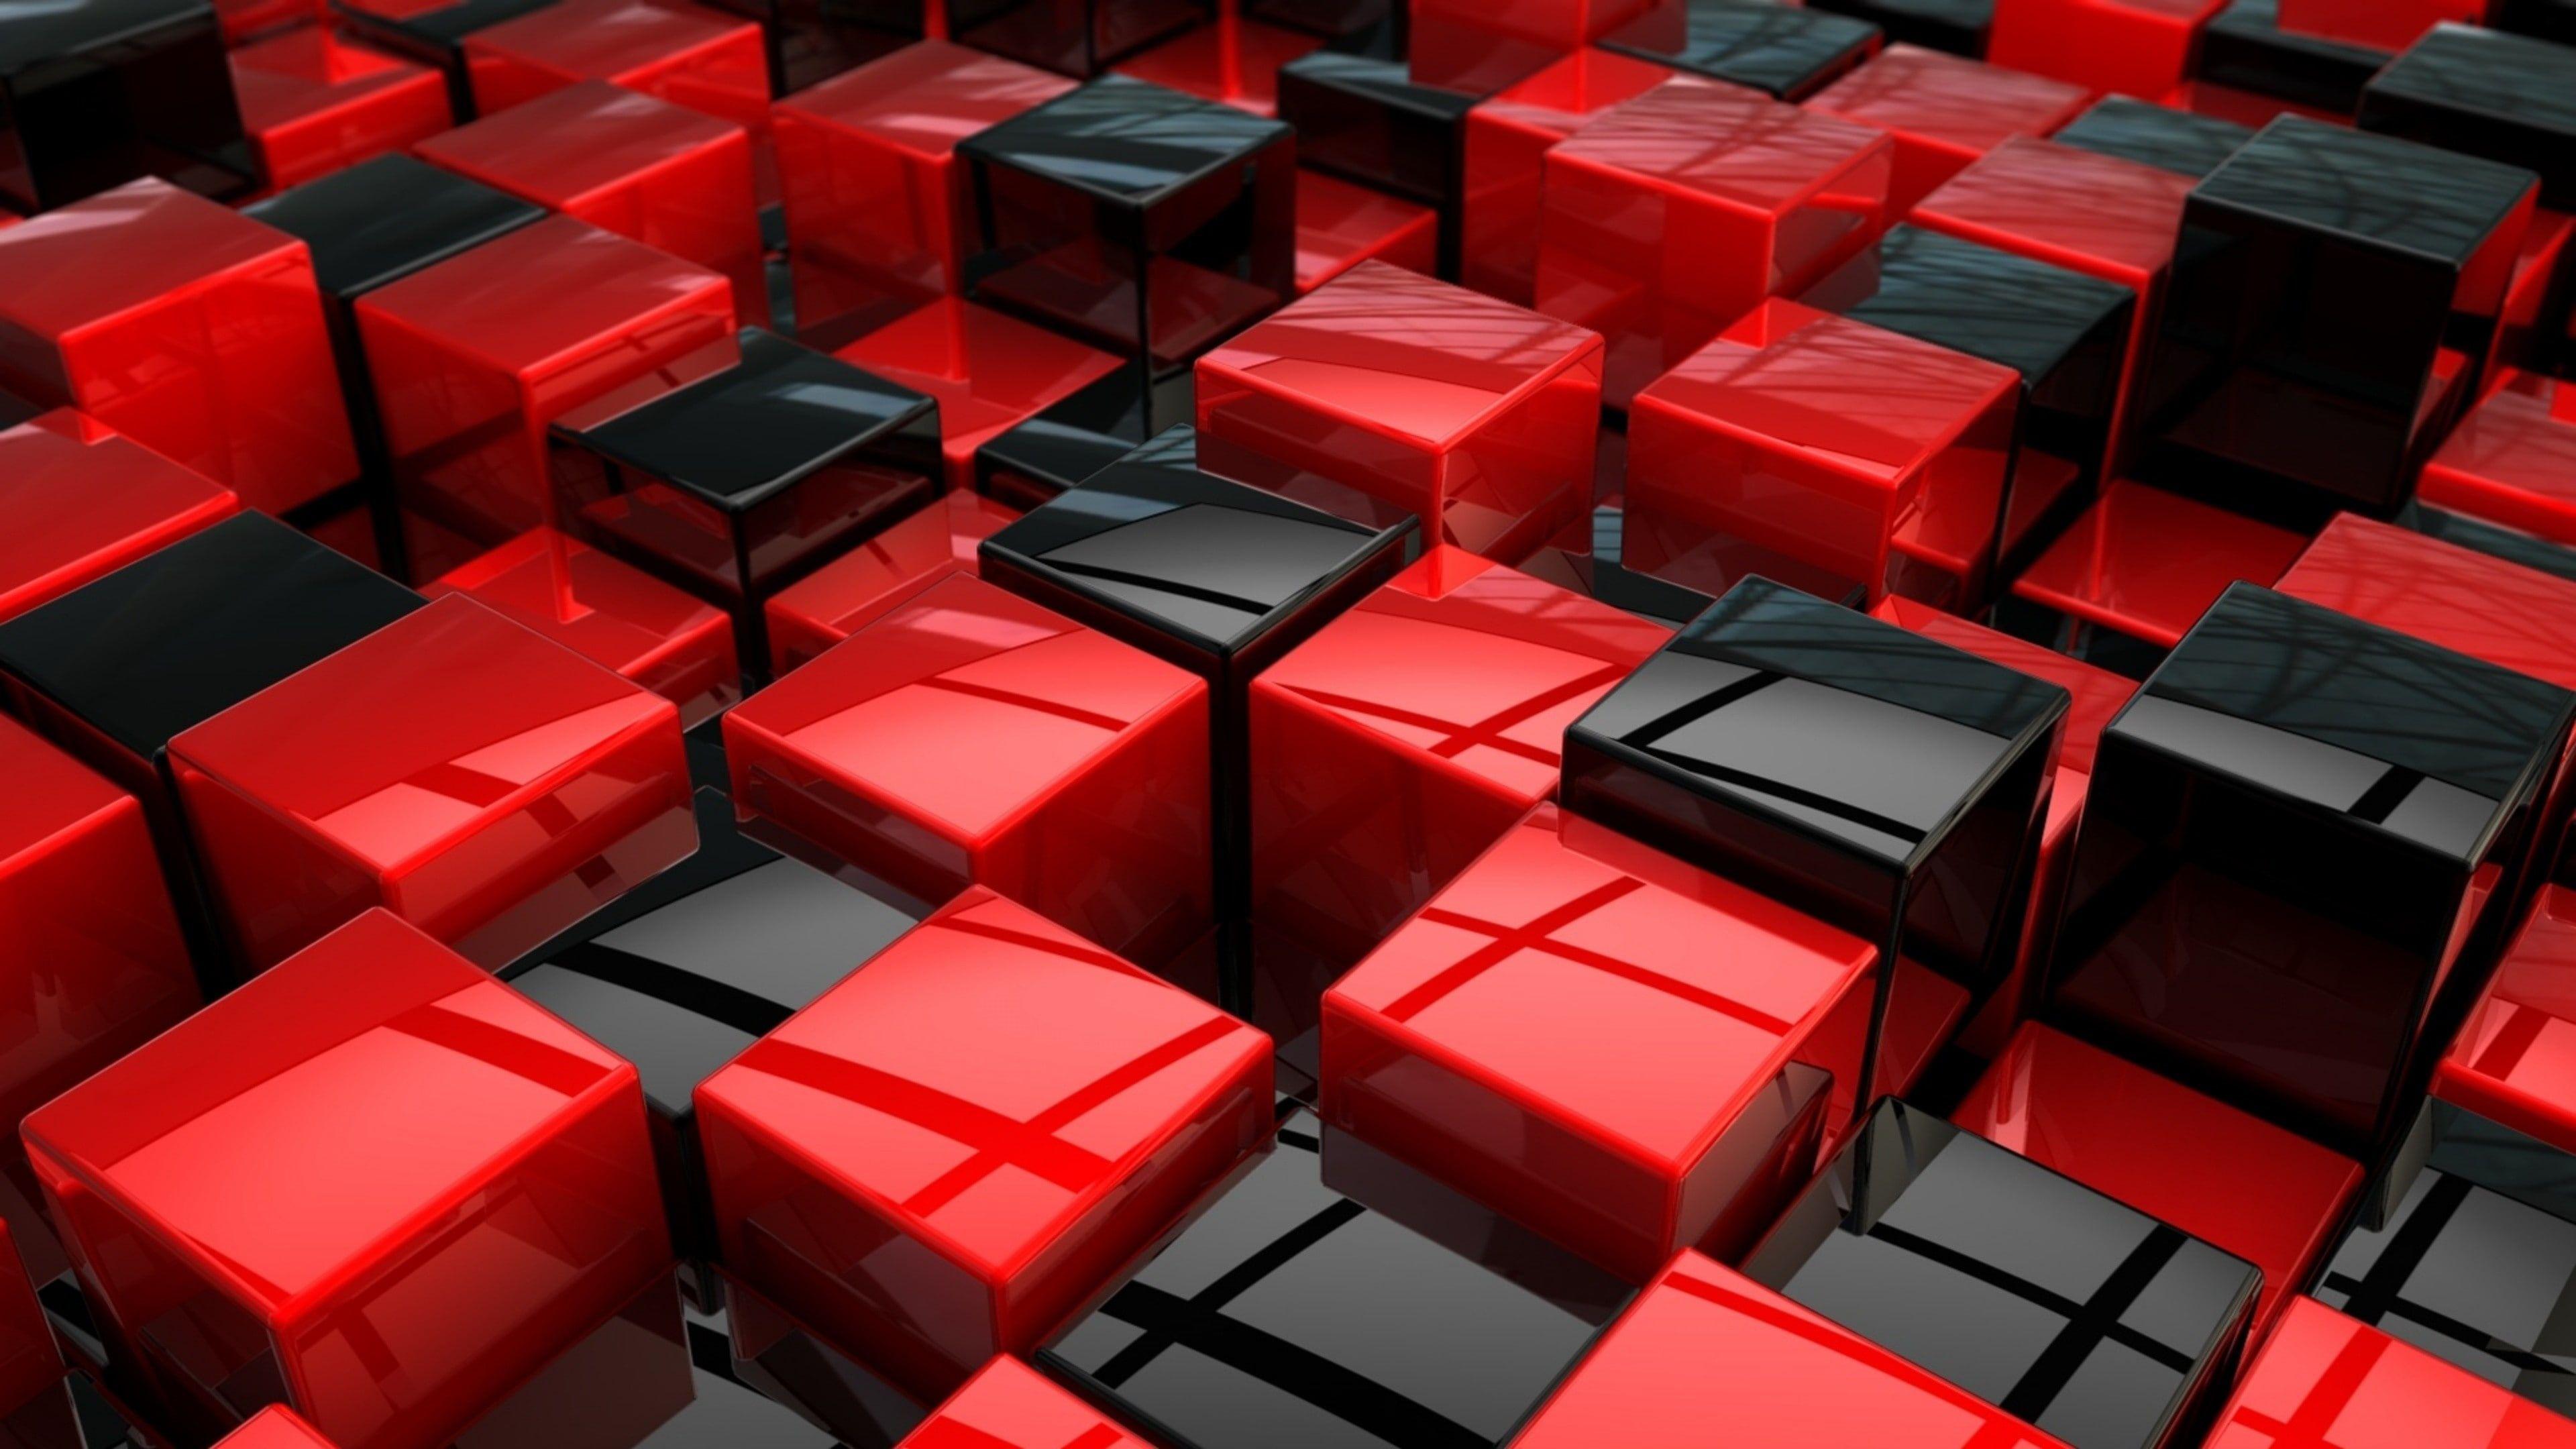 #3d Digital Art #cube Abstract Art #cubes #red #black #4K